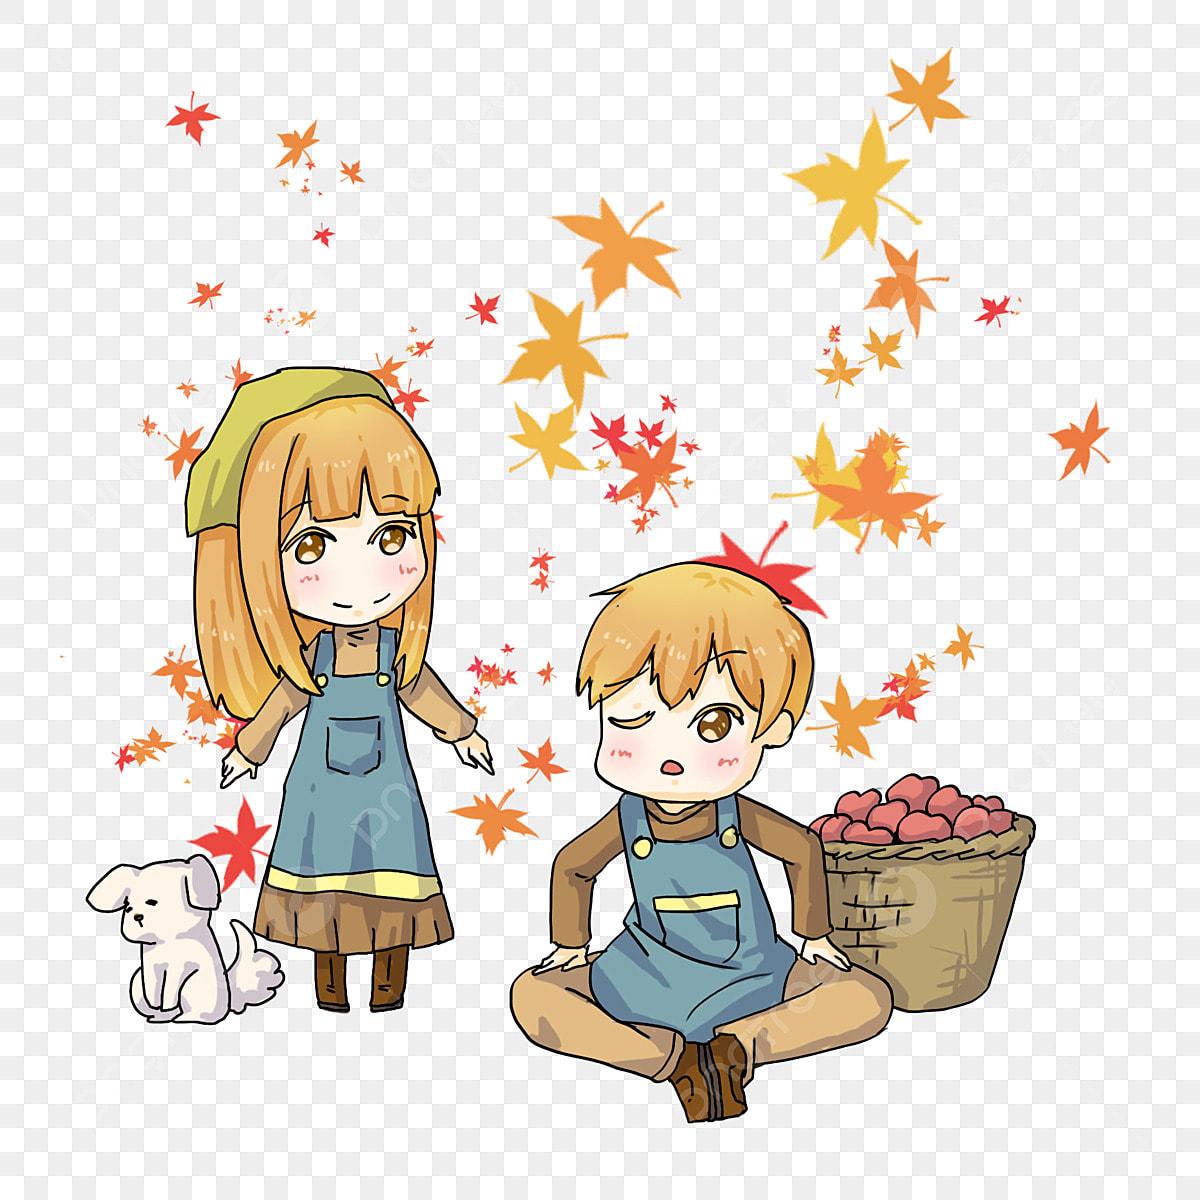 Autumn Fruit Picking Cartoon Characters Boy Girl Yellow Hair Cartoon